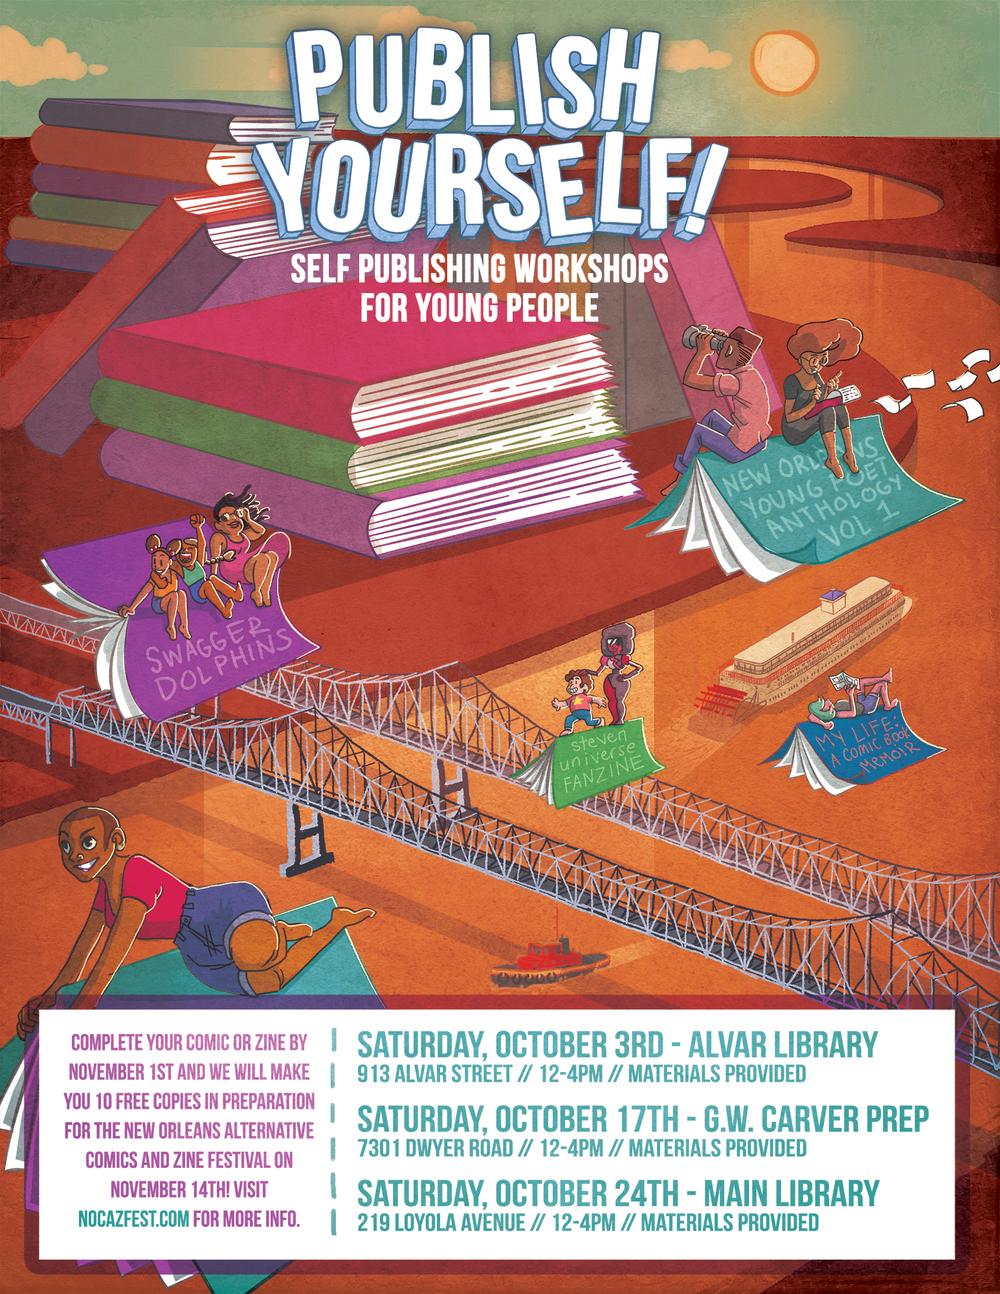 Publish Yourself! Workshop Poster